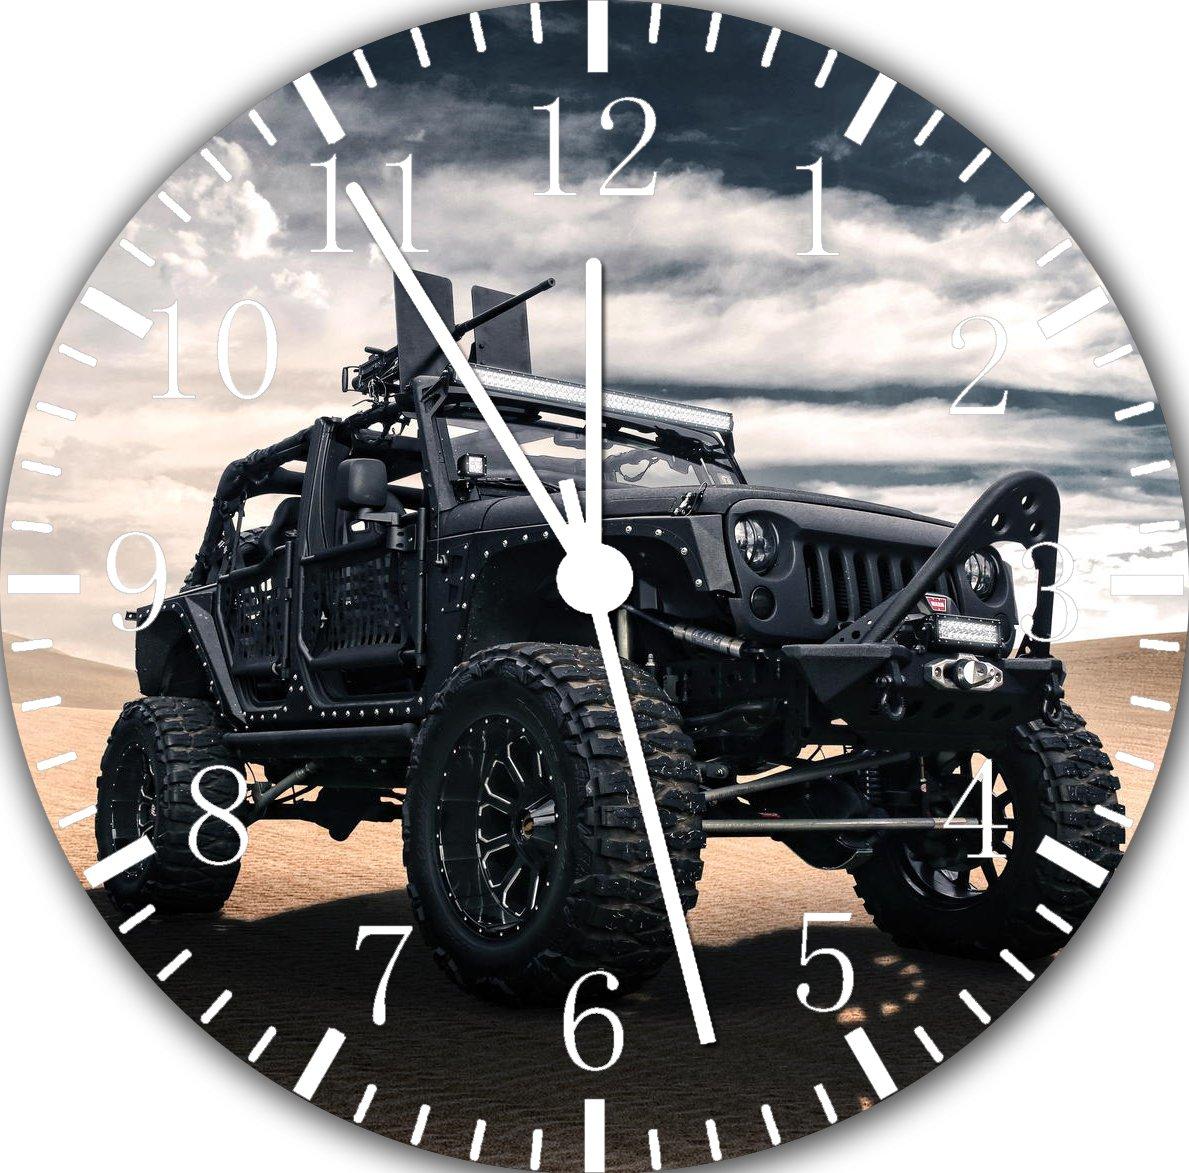 Jeep Wrangler Off Road Frameless Borderless Wall Clock F102 Nice For Gift or Room Wall Decor